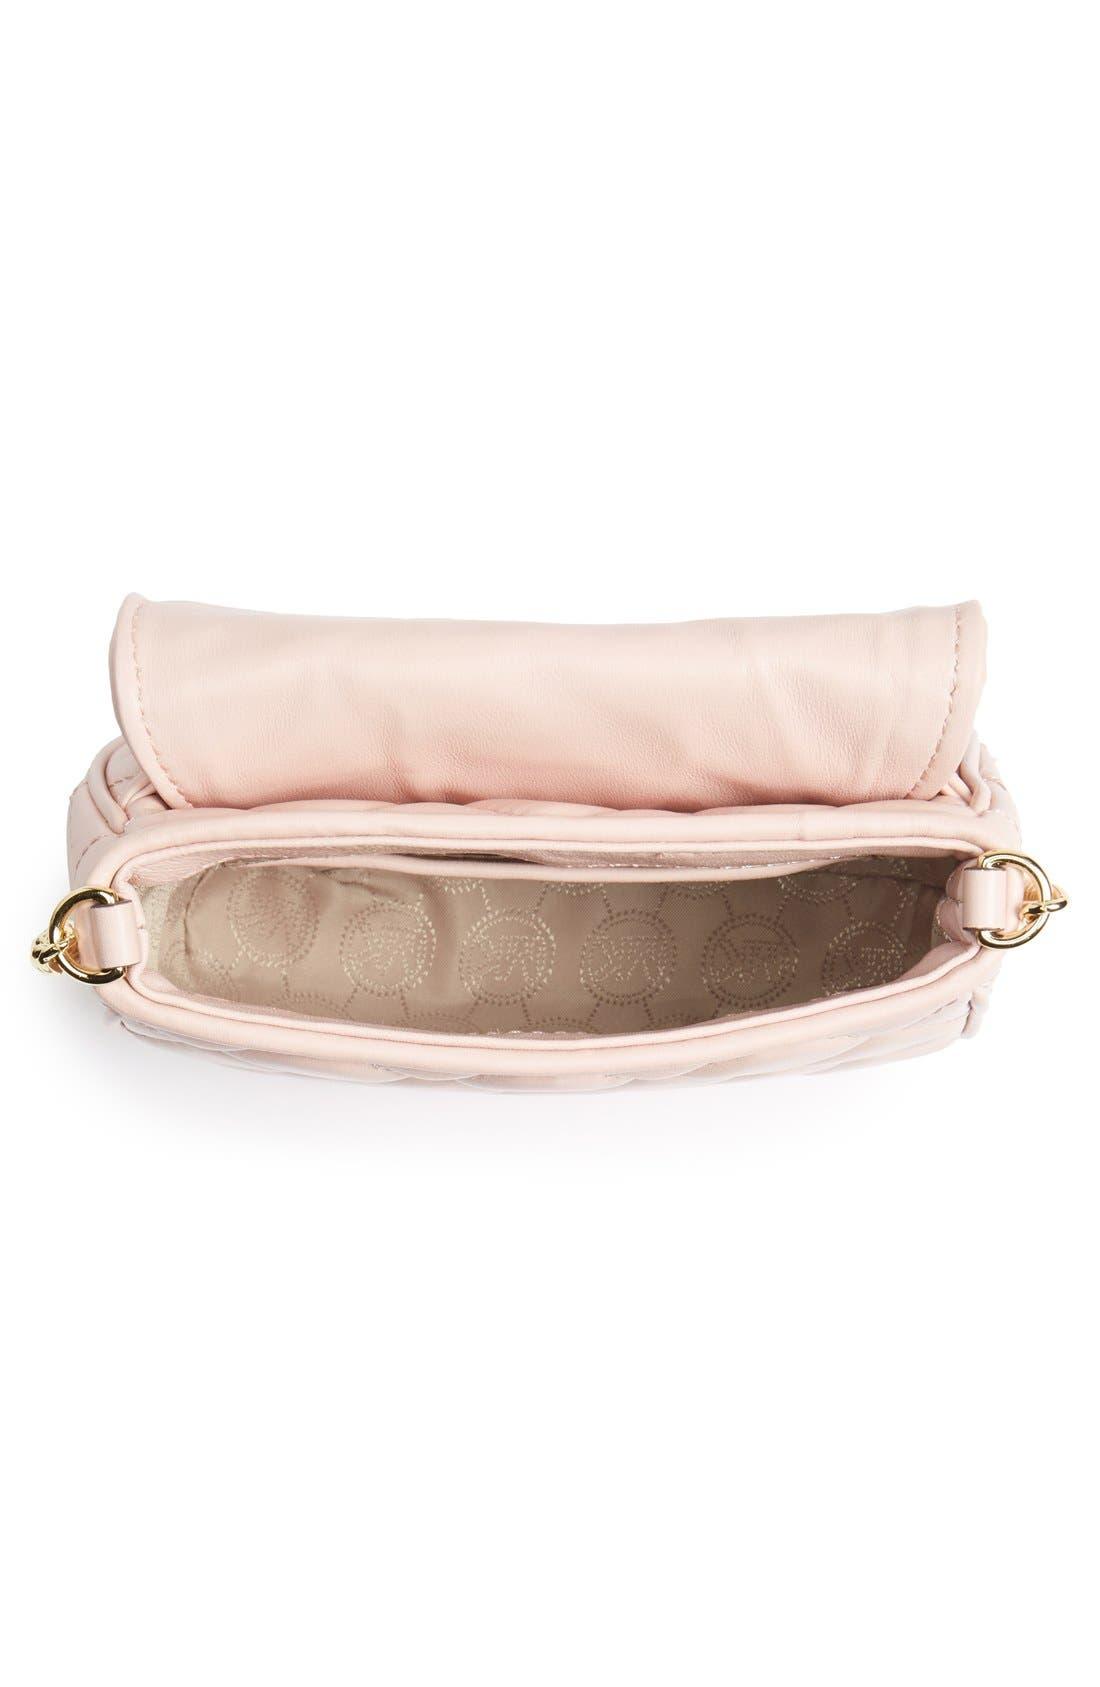 Alternate Image 3  - MICHAEL Michael Kors 'Small Fulton' Quilted Crossbody Bag